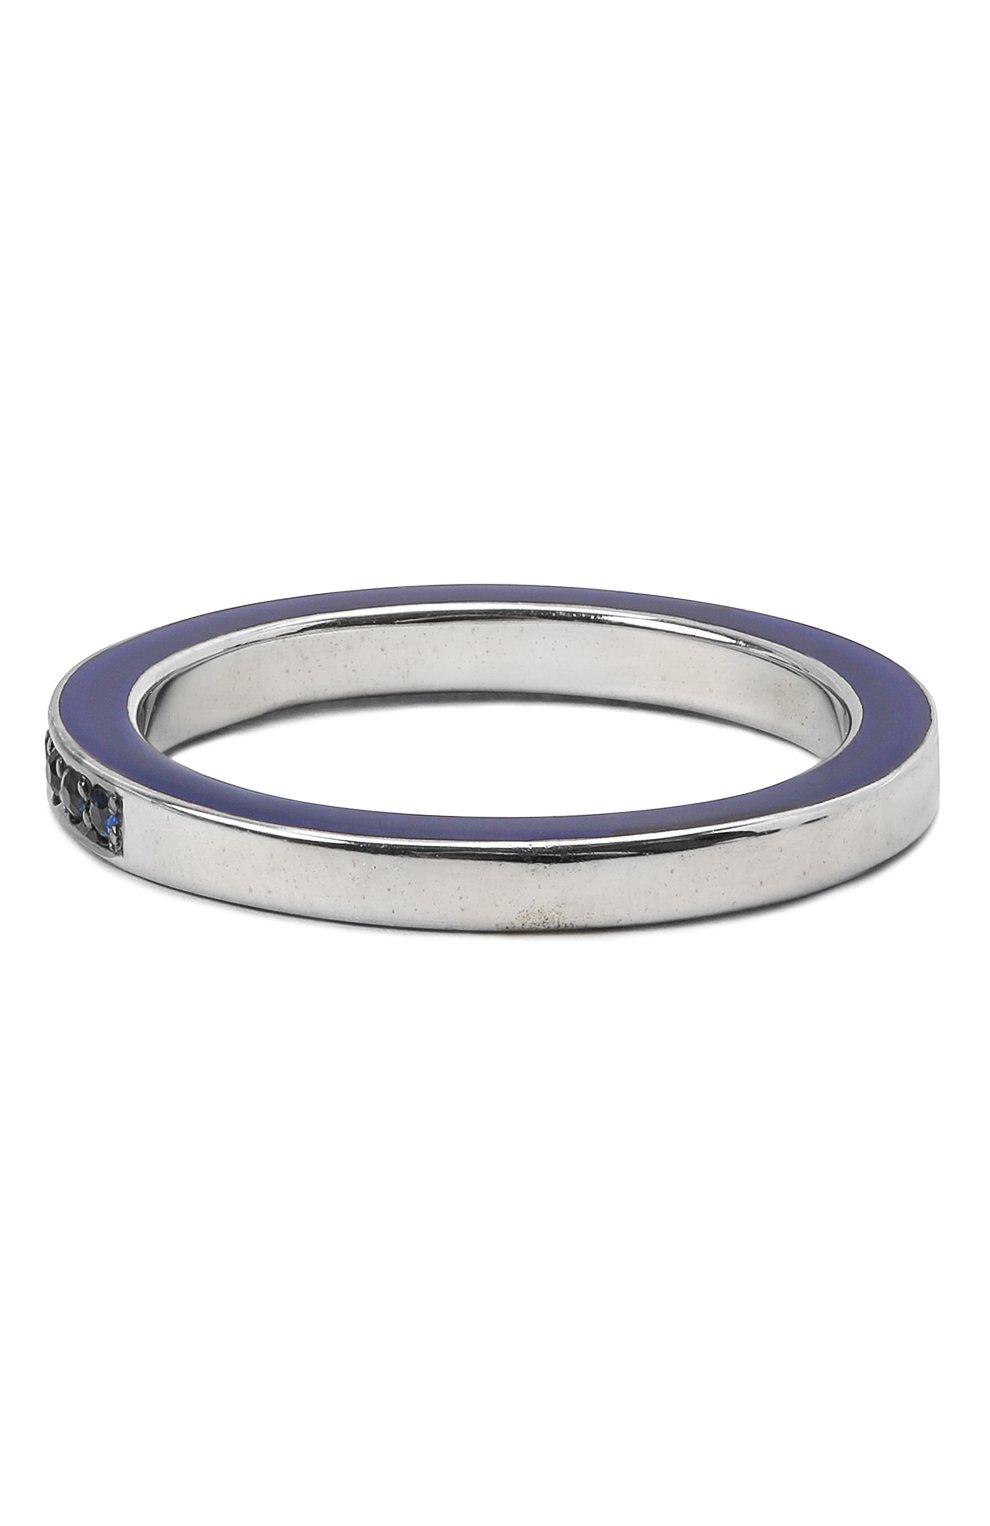 Женское кольцо JEWLIA синего цвета, арт. 0103.JR-55с | Фото 2 (Материал: Золото)